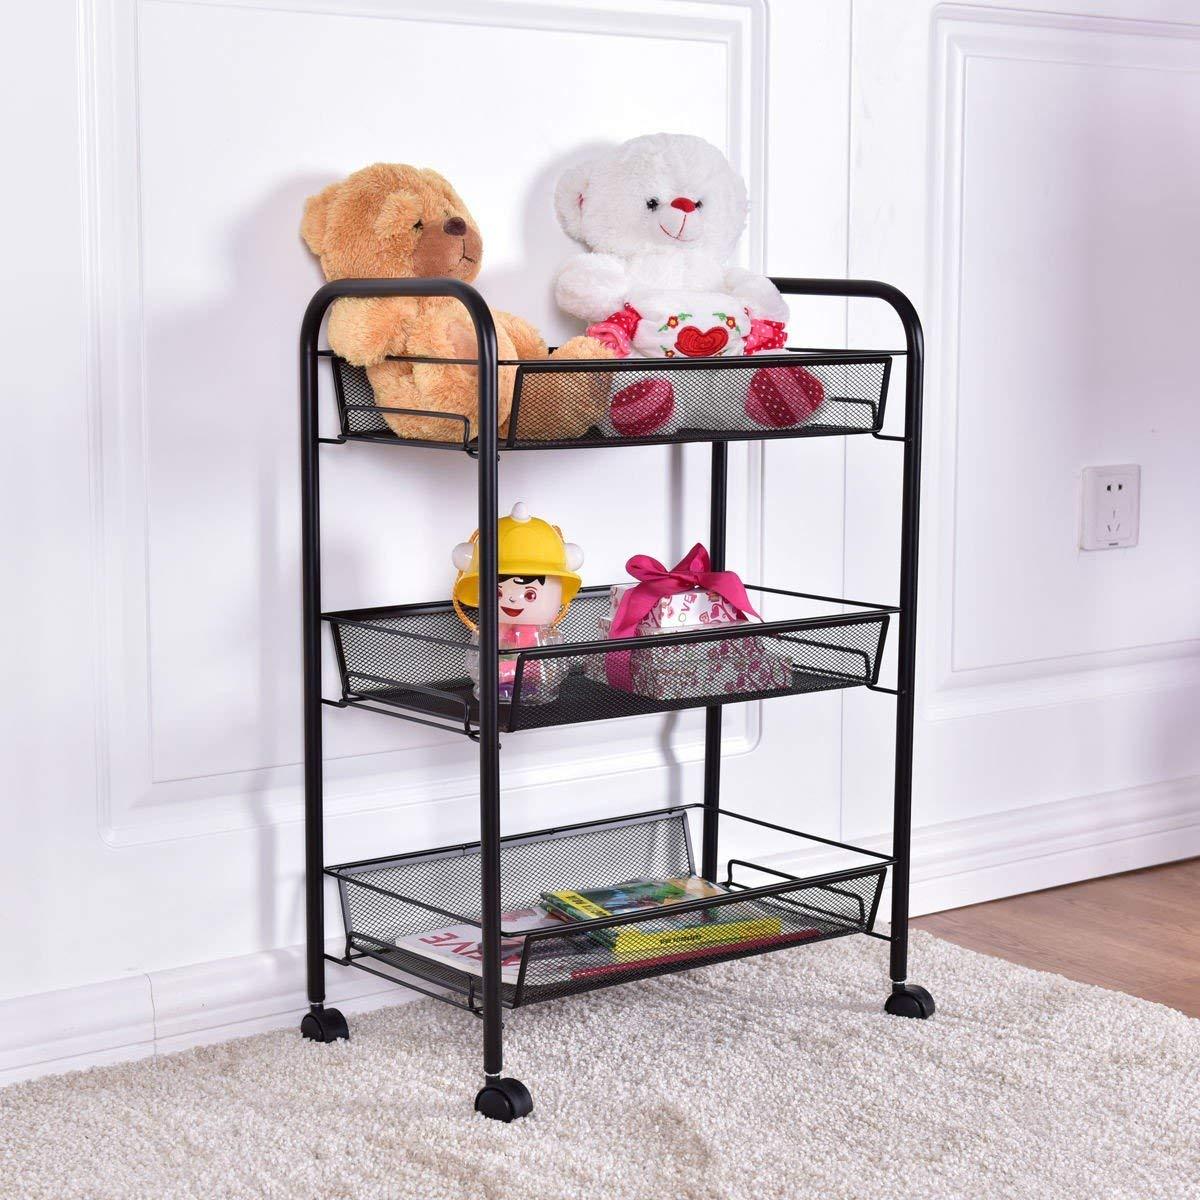 Custpromo 3-Tier Basket Stand Kitchen Bathroom Trolley Full-Metal Rolling Storage Cart With Steel Mesh Baskets for storage (Black)